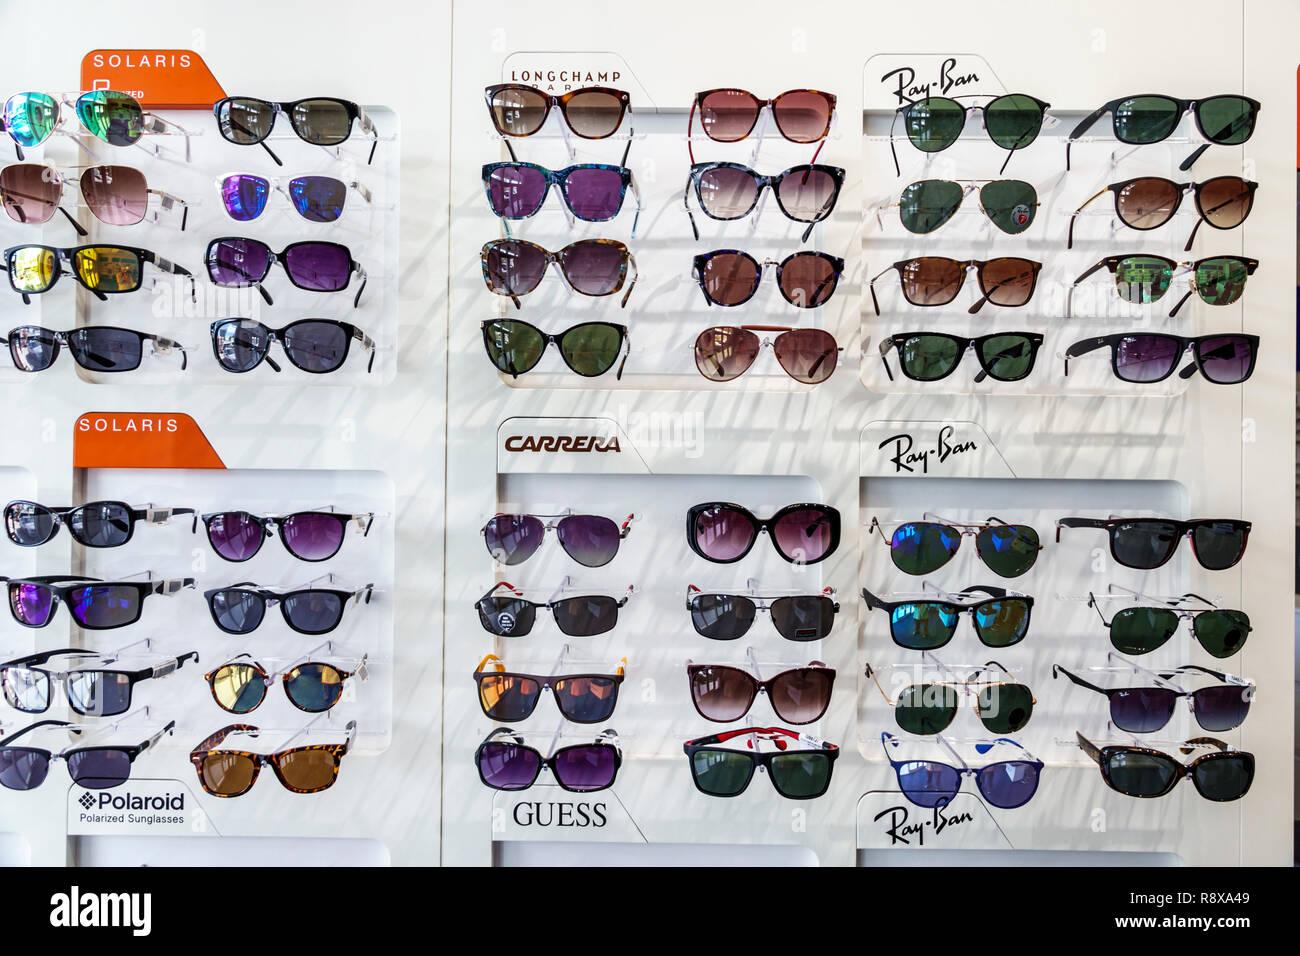 26f8850aec8951 Miami Beach, Florida Optiker Optiker Business Store Brillen Anzeige Verkauf  mode Solaris Longchamp Carrera Ray